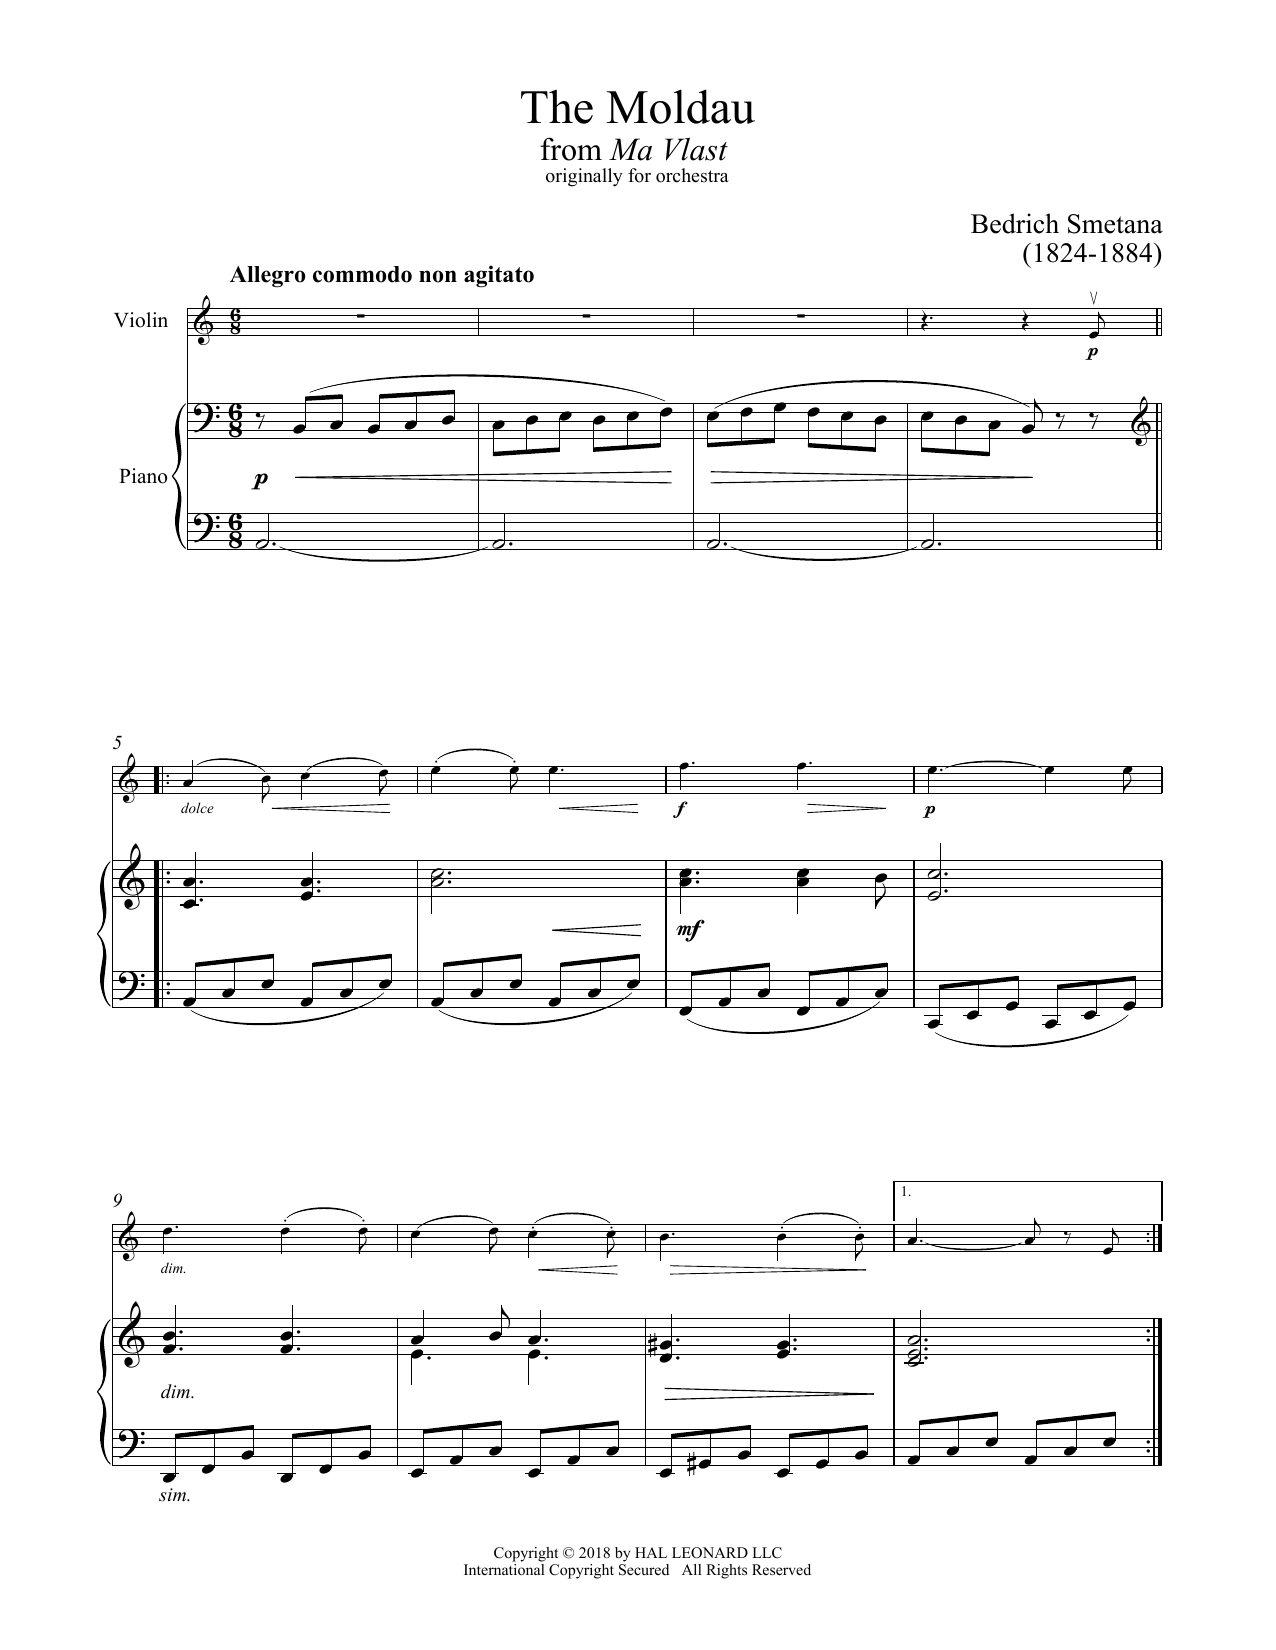 Bedřich Smetana The Moldau sheet music notes and chords. Download Printable PDF.